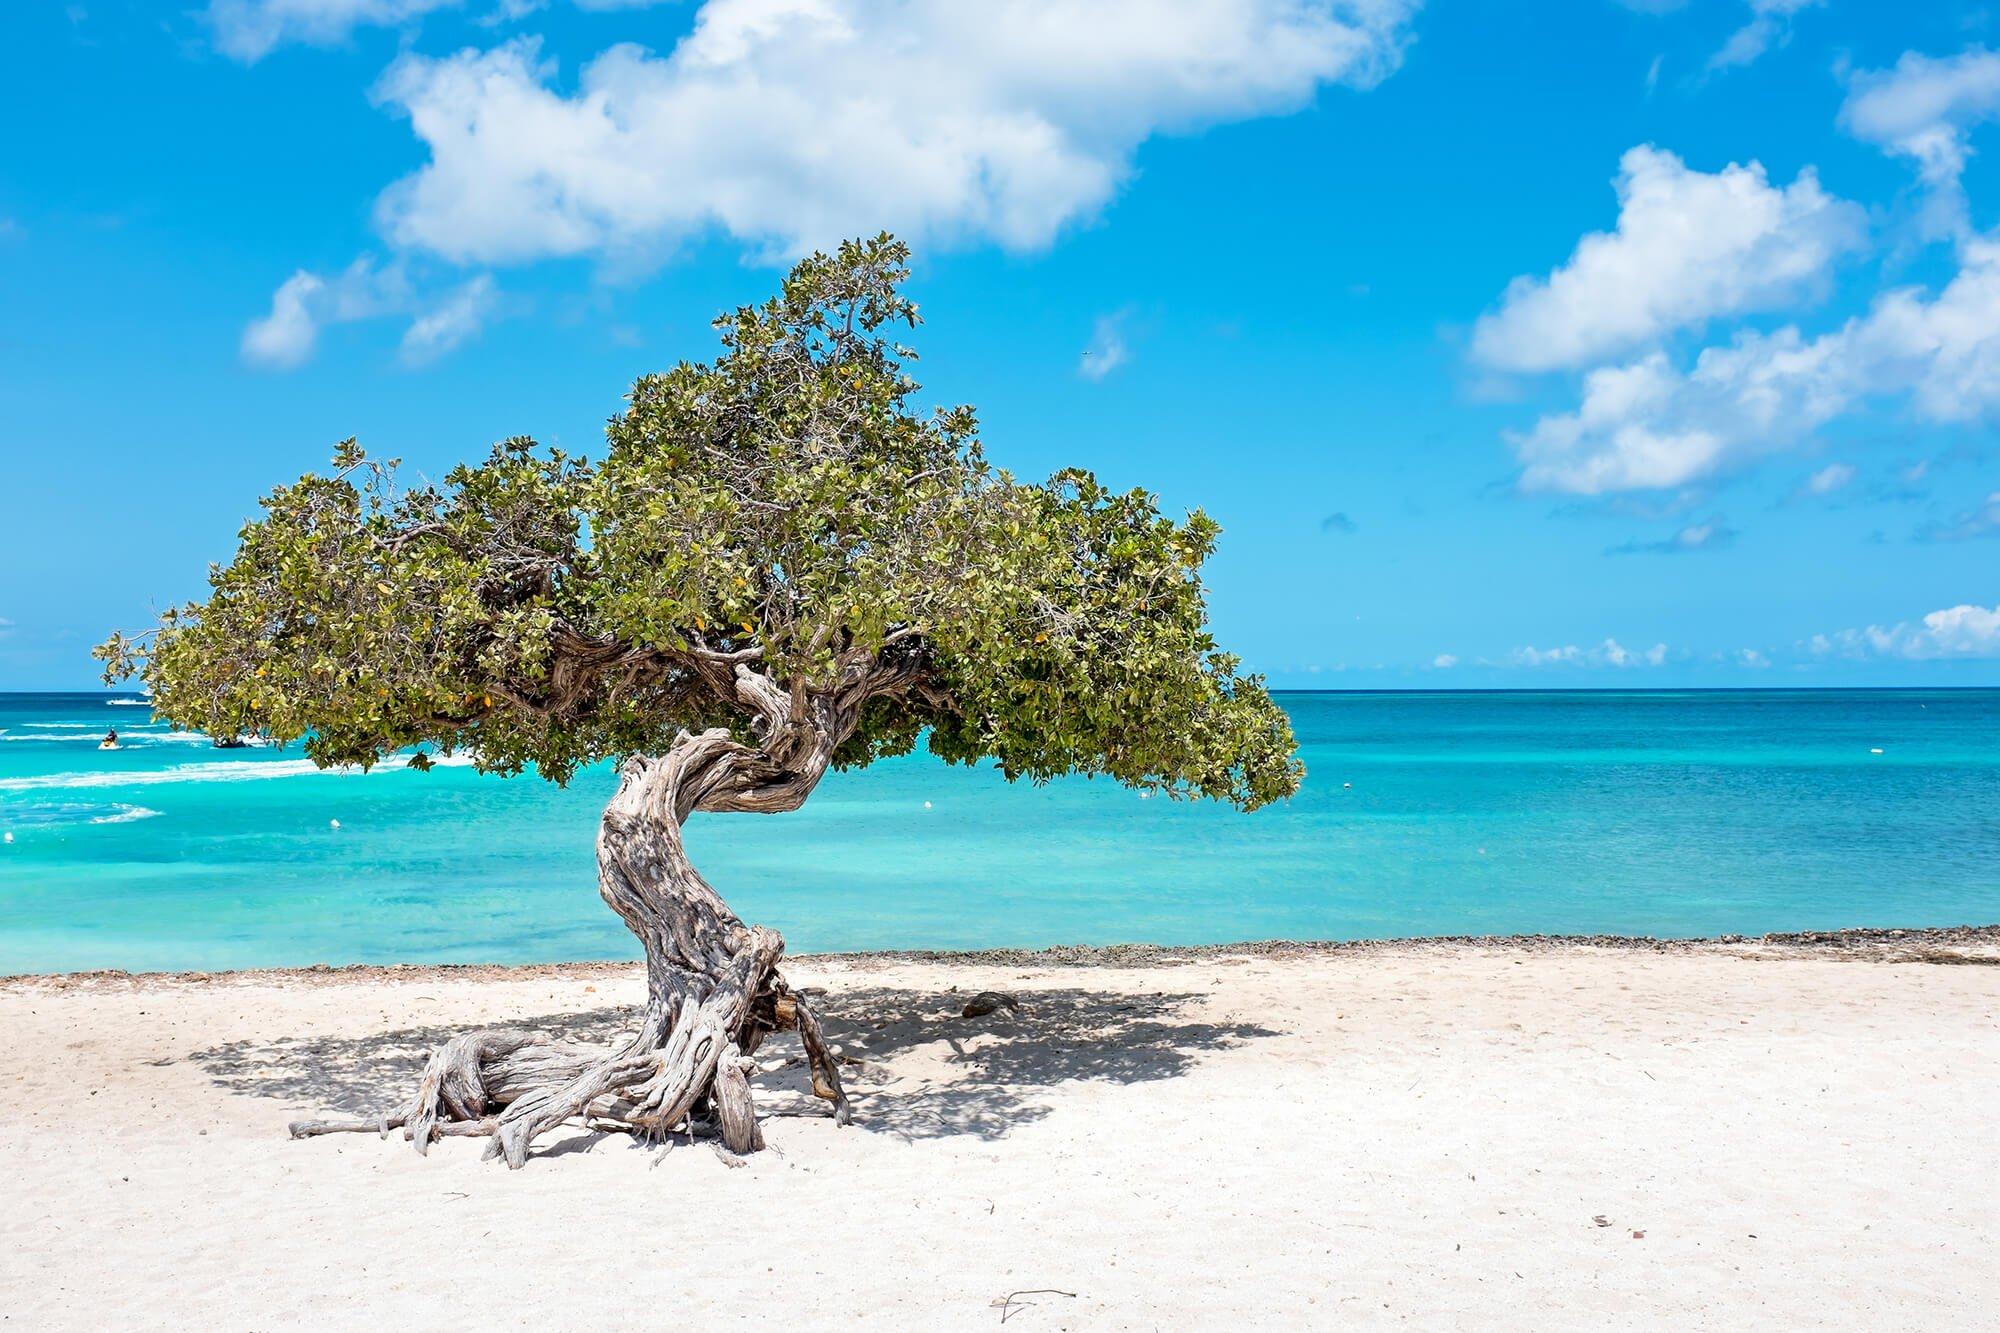 A tree on the beach in Aruba